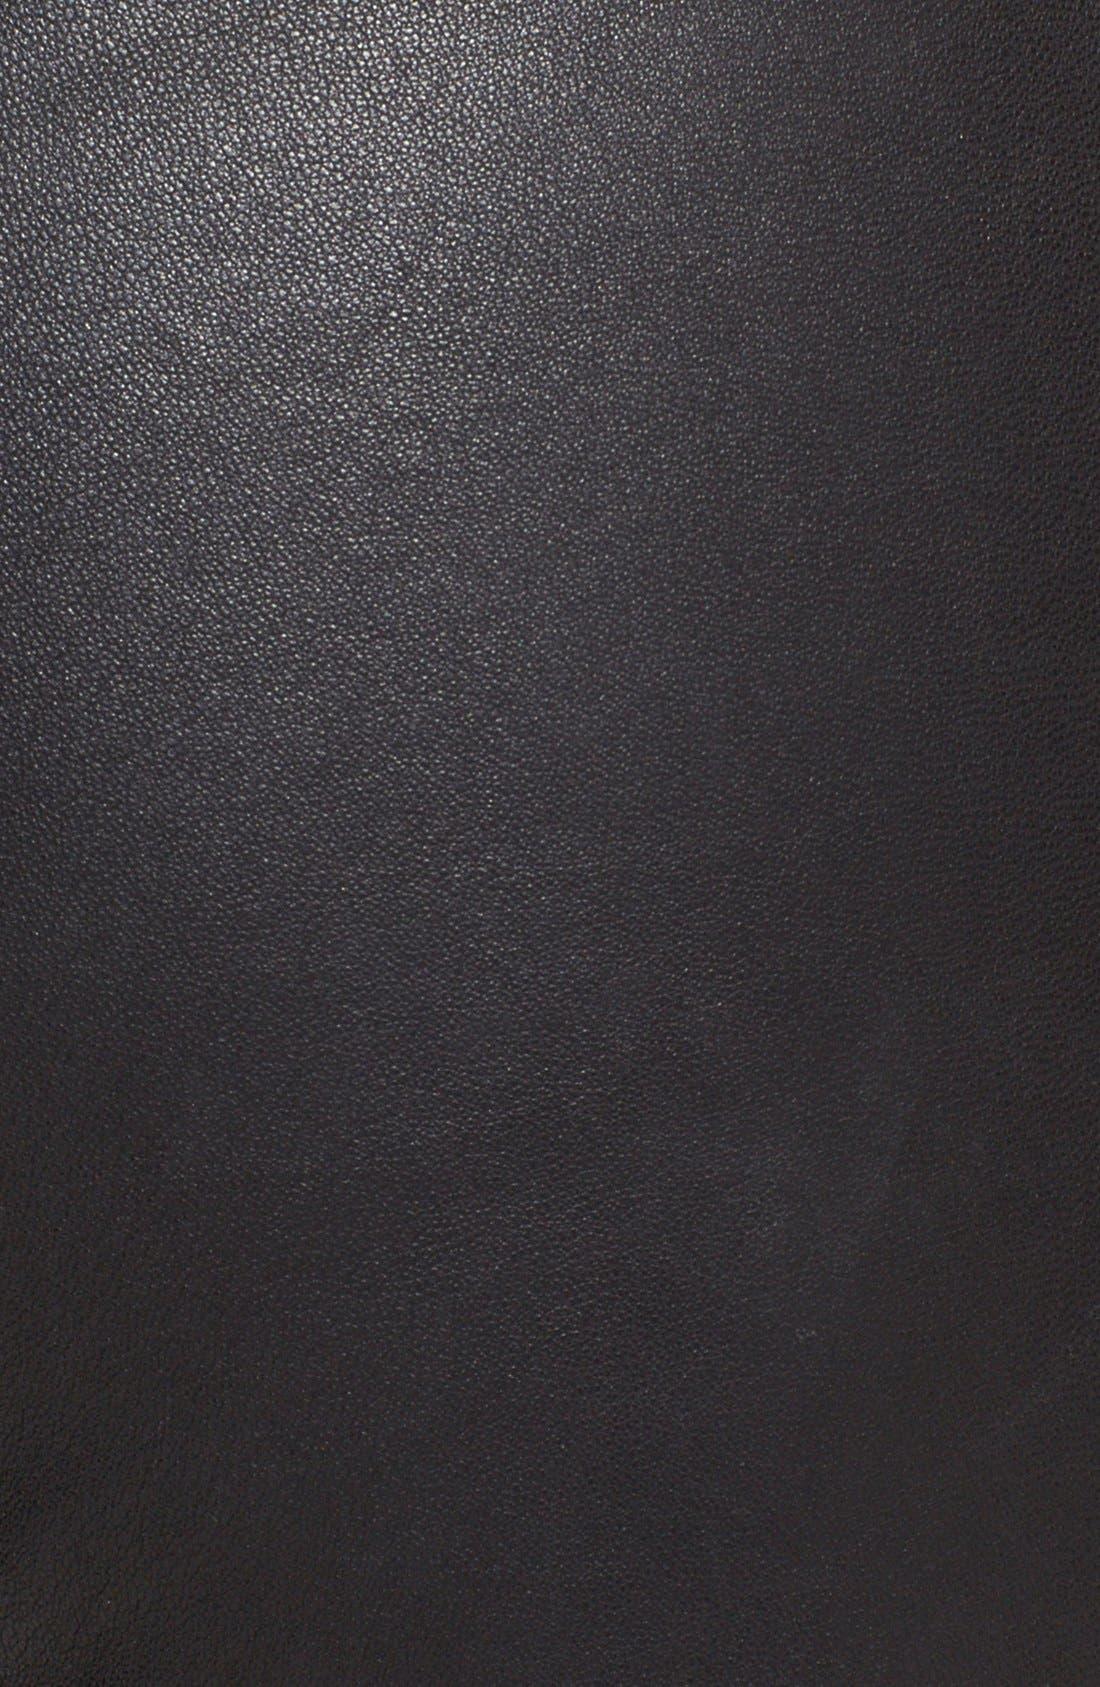 Alternate Image 3  - Lanvin Stretch Lambskin Leather Leggings